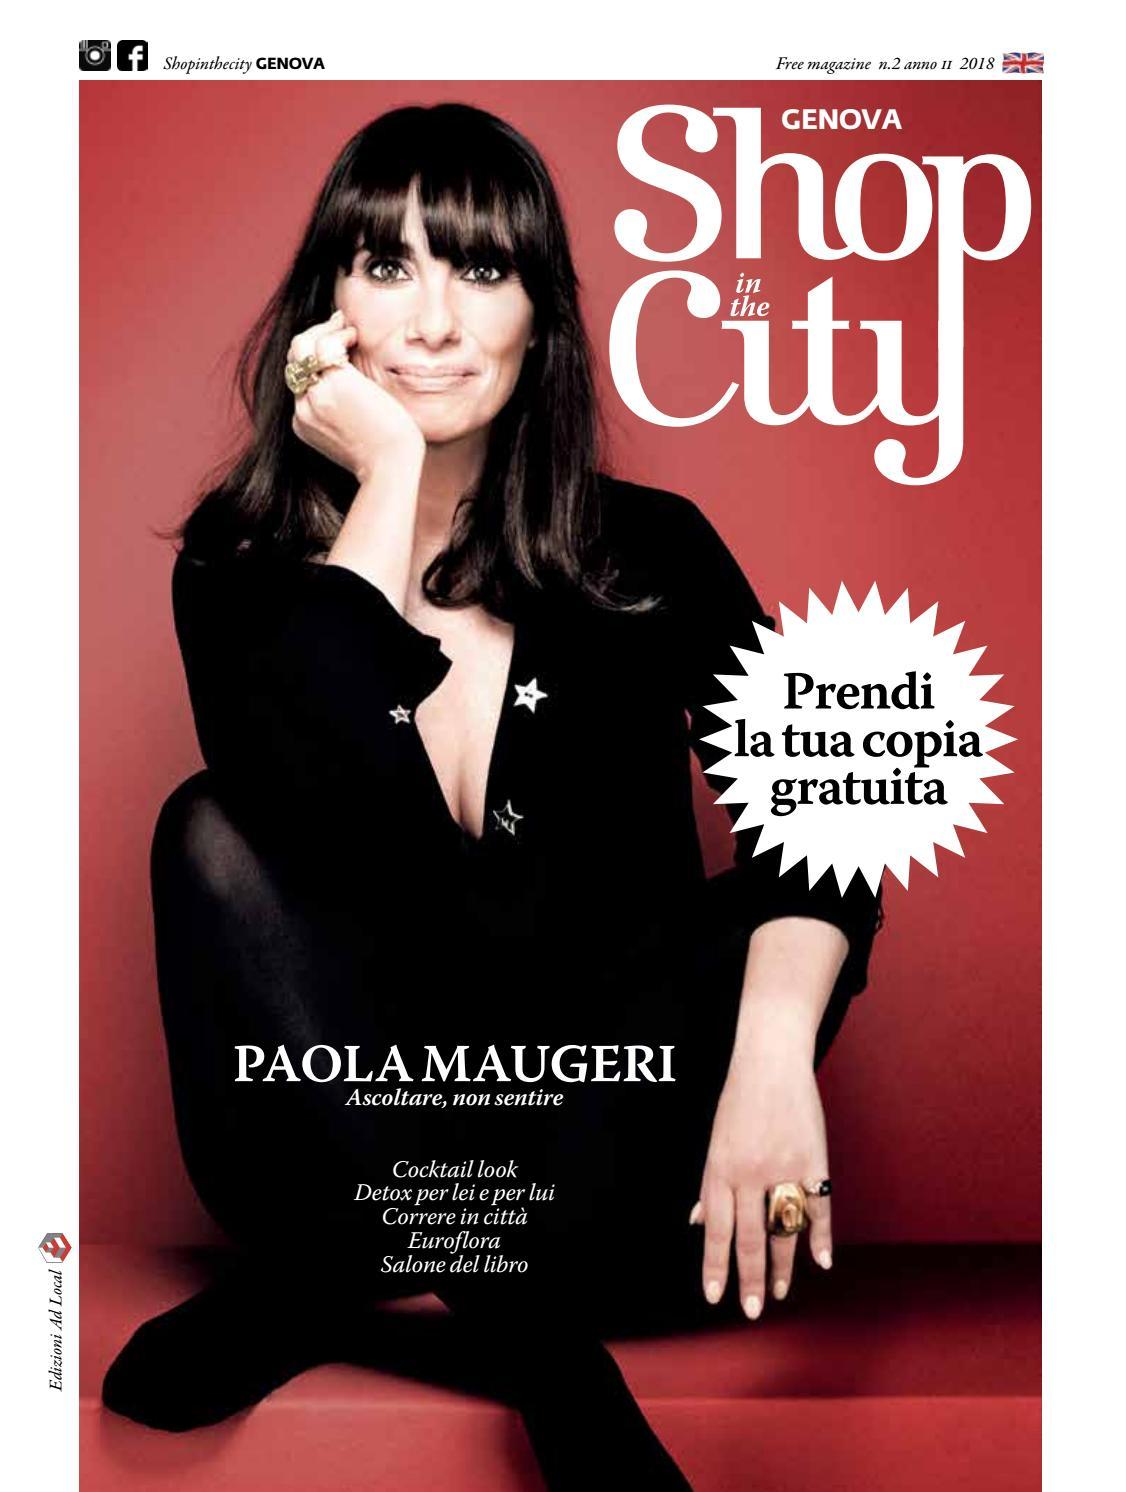 Shopinthecity Genova by ShopintheCity - issuu 9ff48d285aa